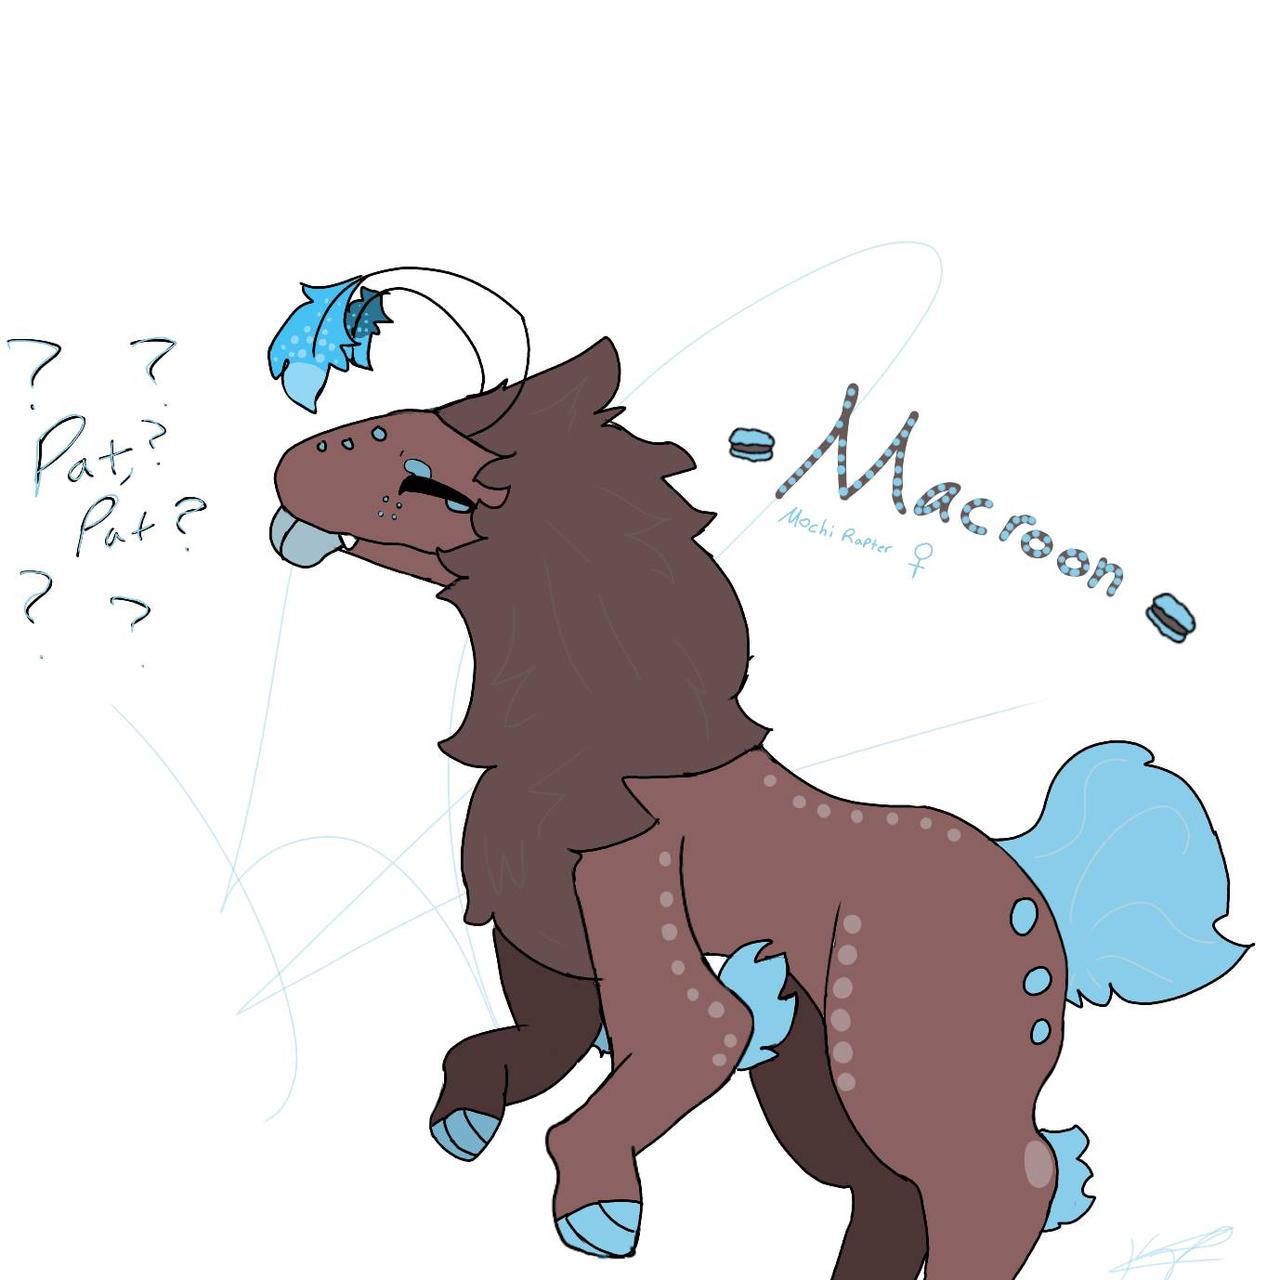 my mochi raptor oc by jikzal on deviantart my mochi raptor oc by jikzal on deviantart